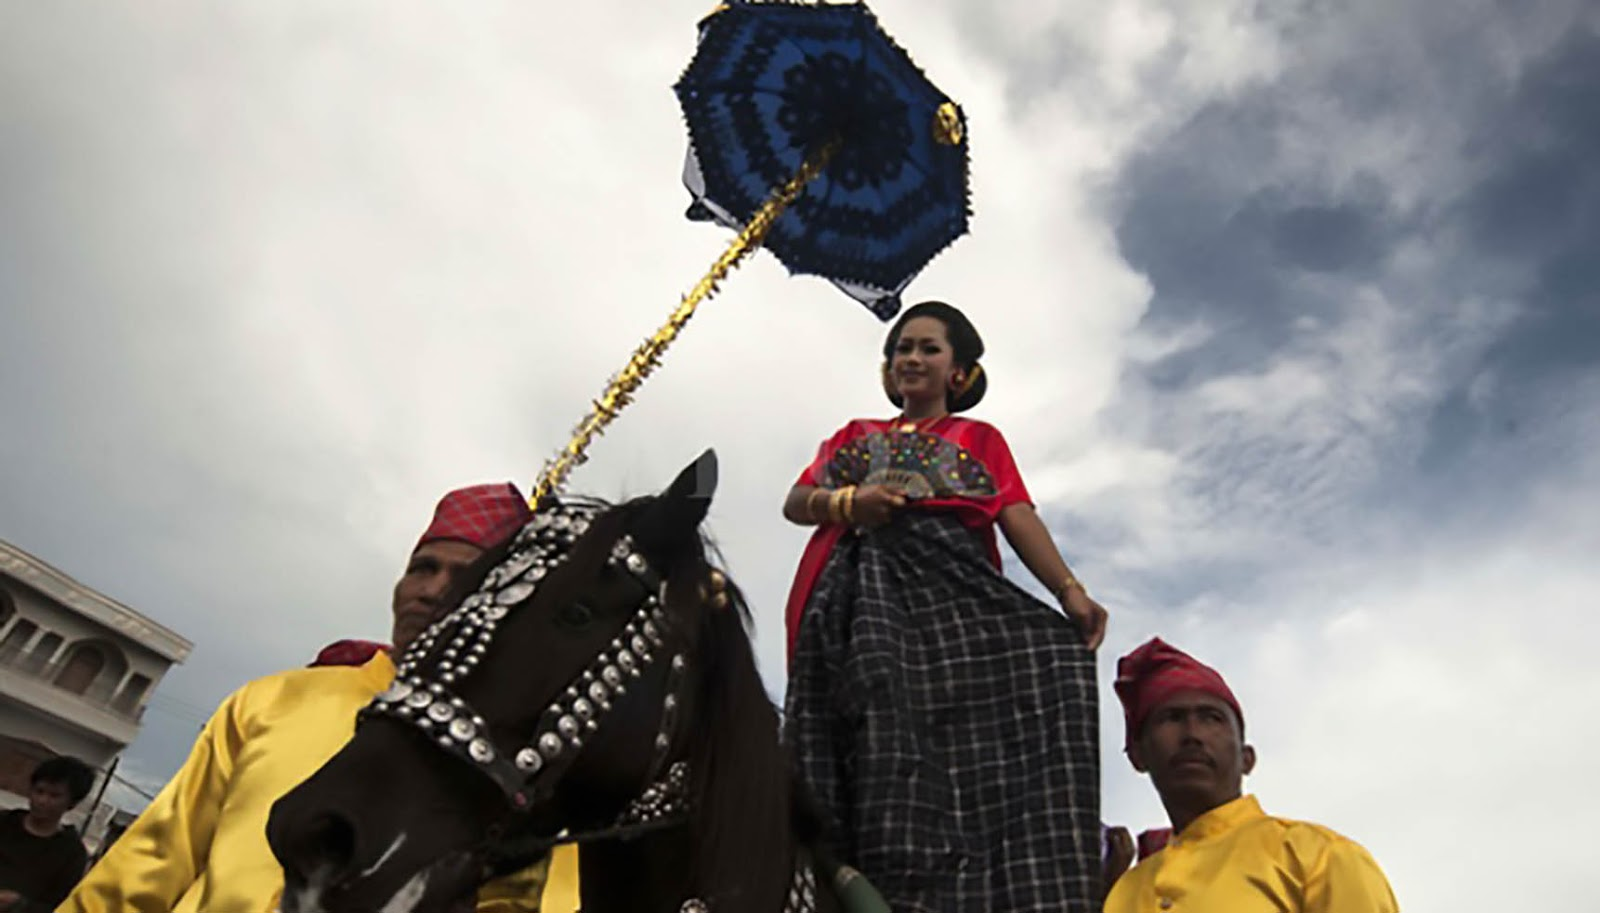 Saiyyang Pattuqduq, Kesenian Tradisional Dari Mandar